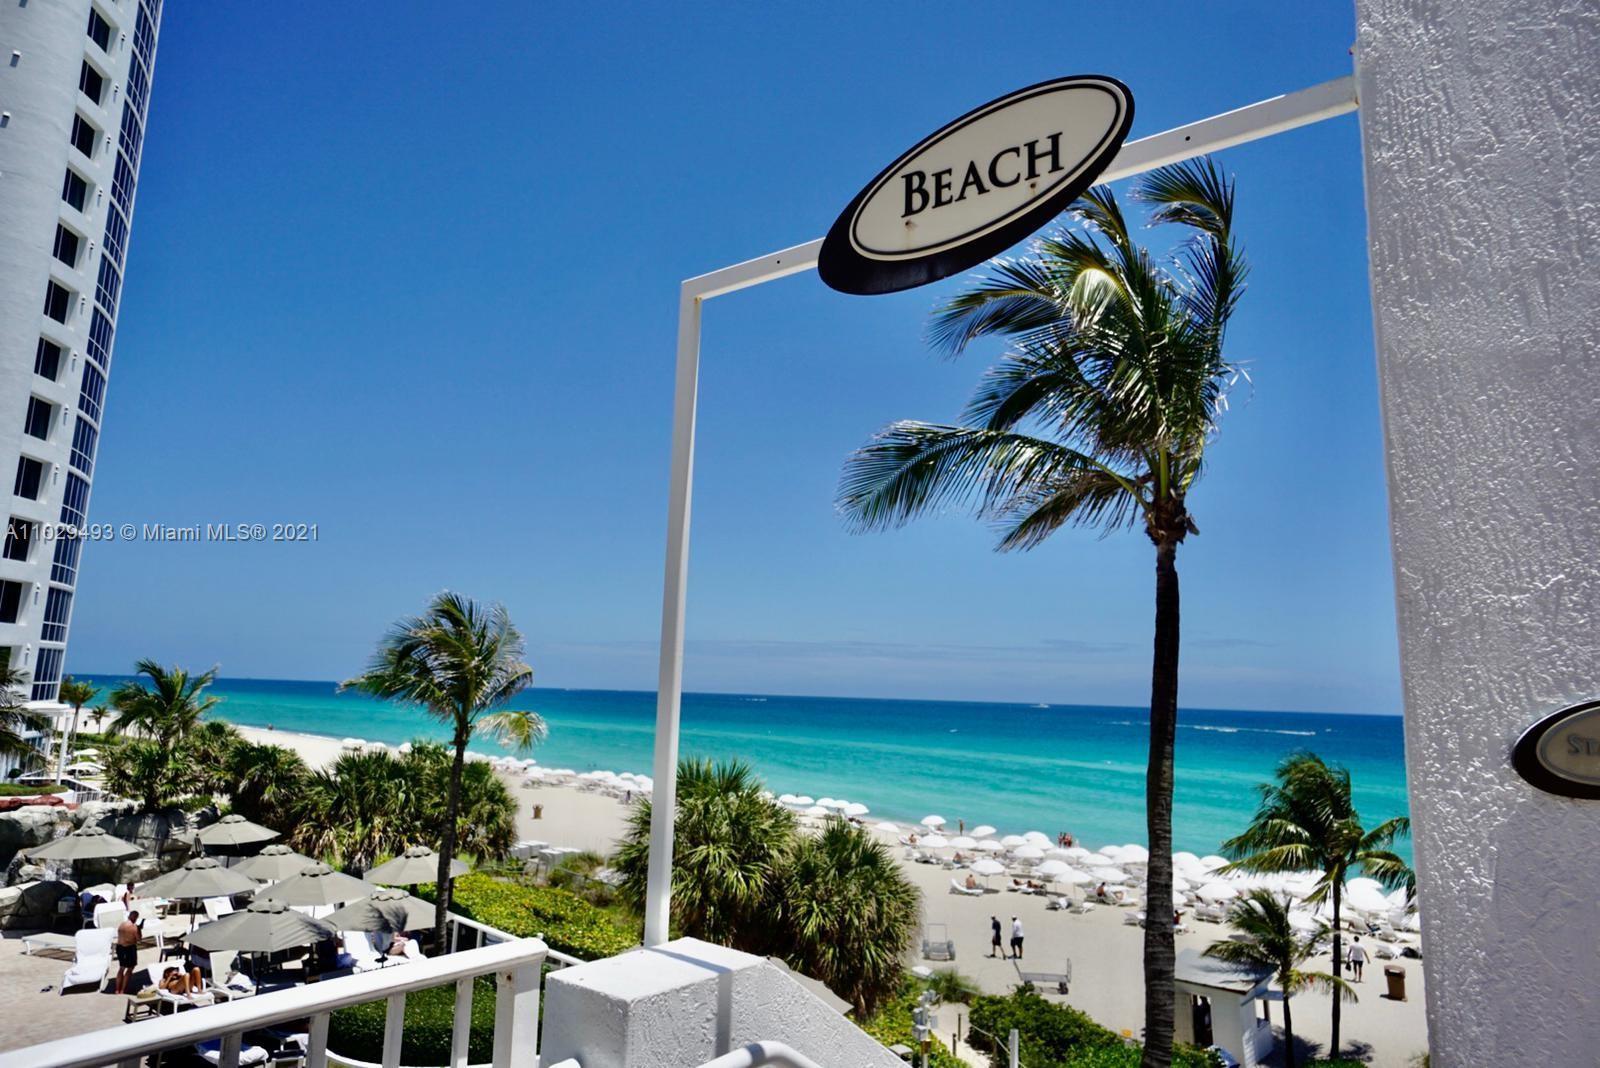 Trump International #704 - 18001 SW Collins Ave #704, Sunny Isles Beach, FL 33160